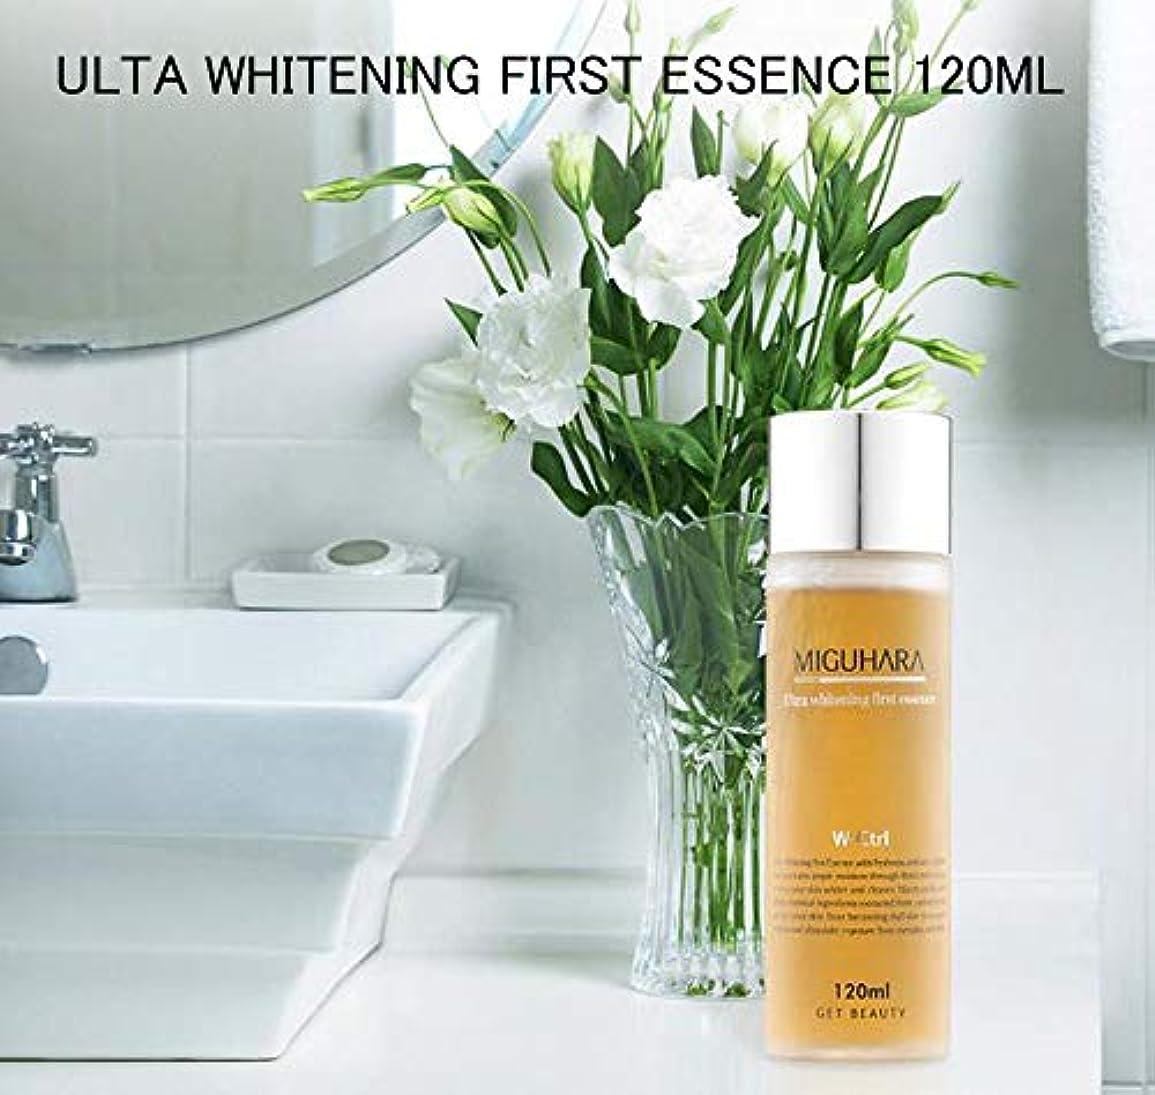 MIGUHARA Ultra Whitening First Essence 120ml/ウルトラホワイトニングファーストエッセンス